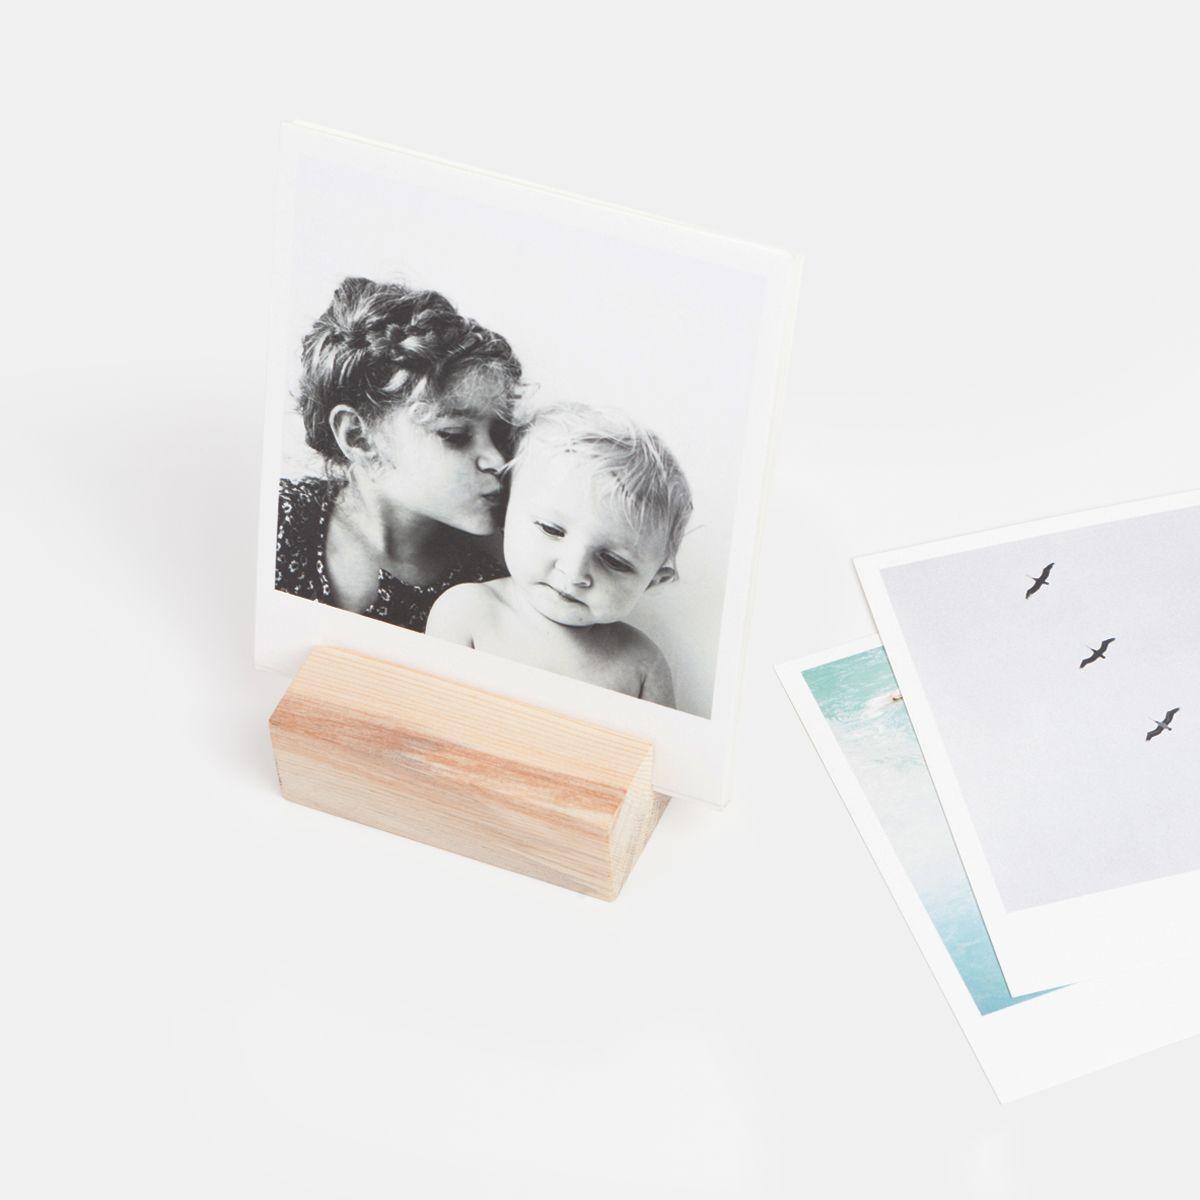 wood-block-and-prints-main03-brother-and-sister-photo_2x.jpeg